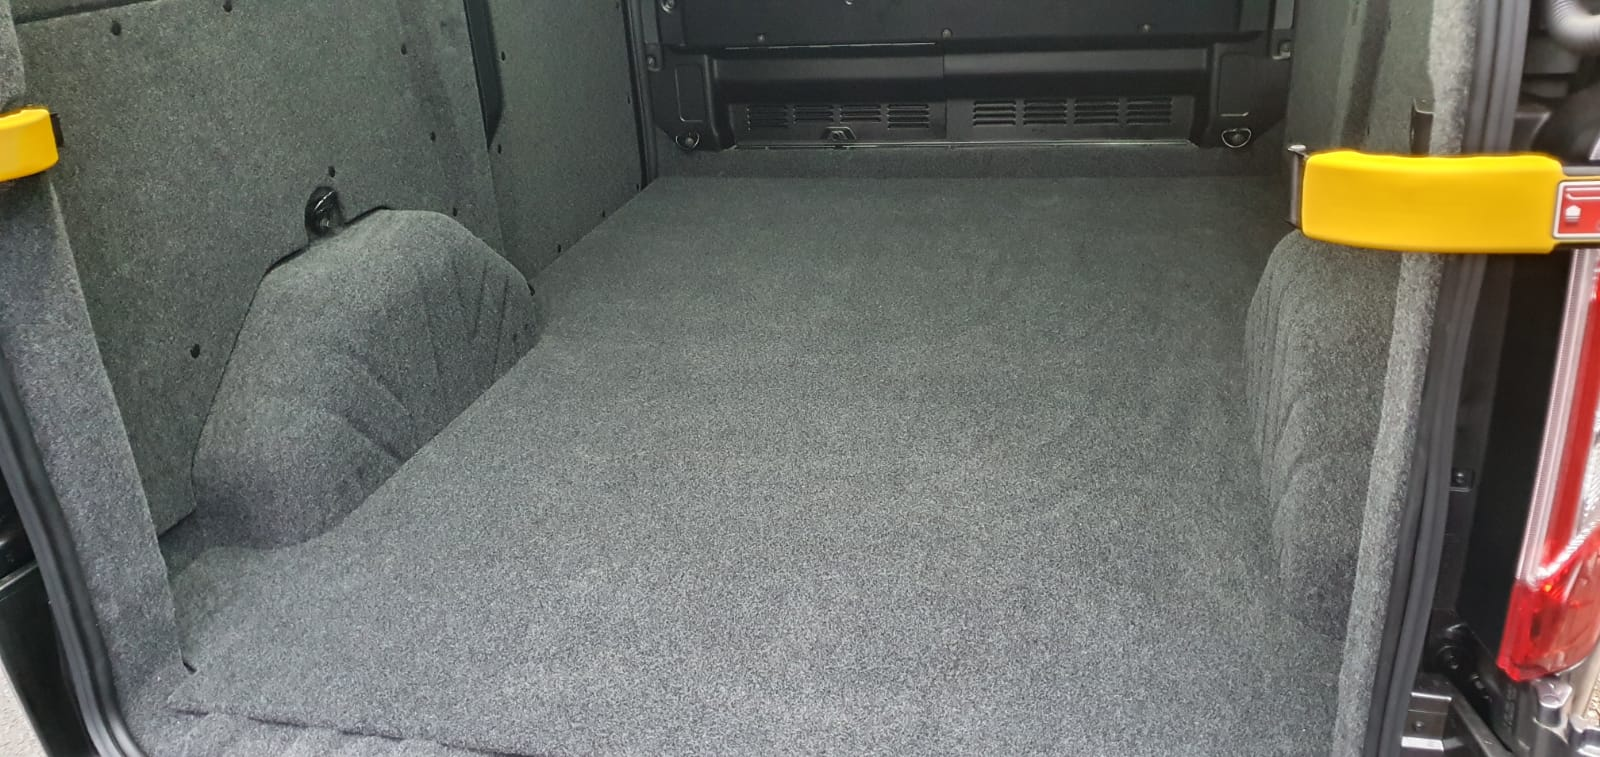 Ford Transit Custom Carpet Lining Nottingham - Ford Transit Carpet Lining Derby